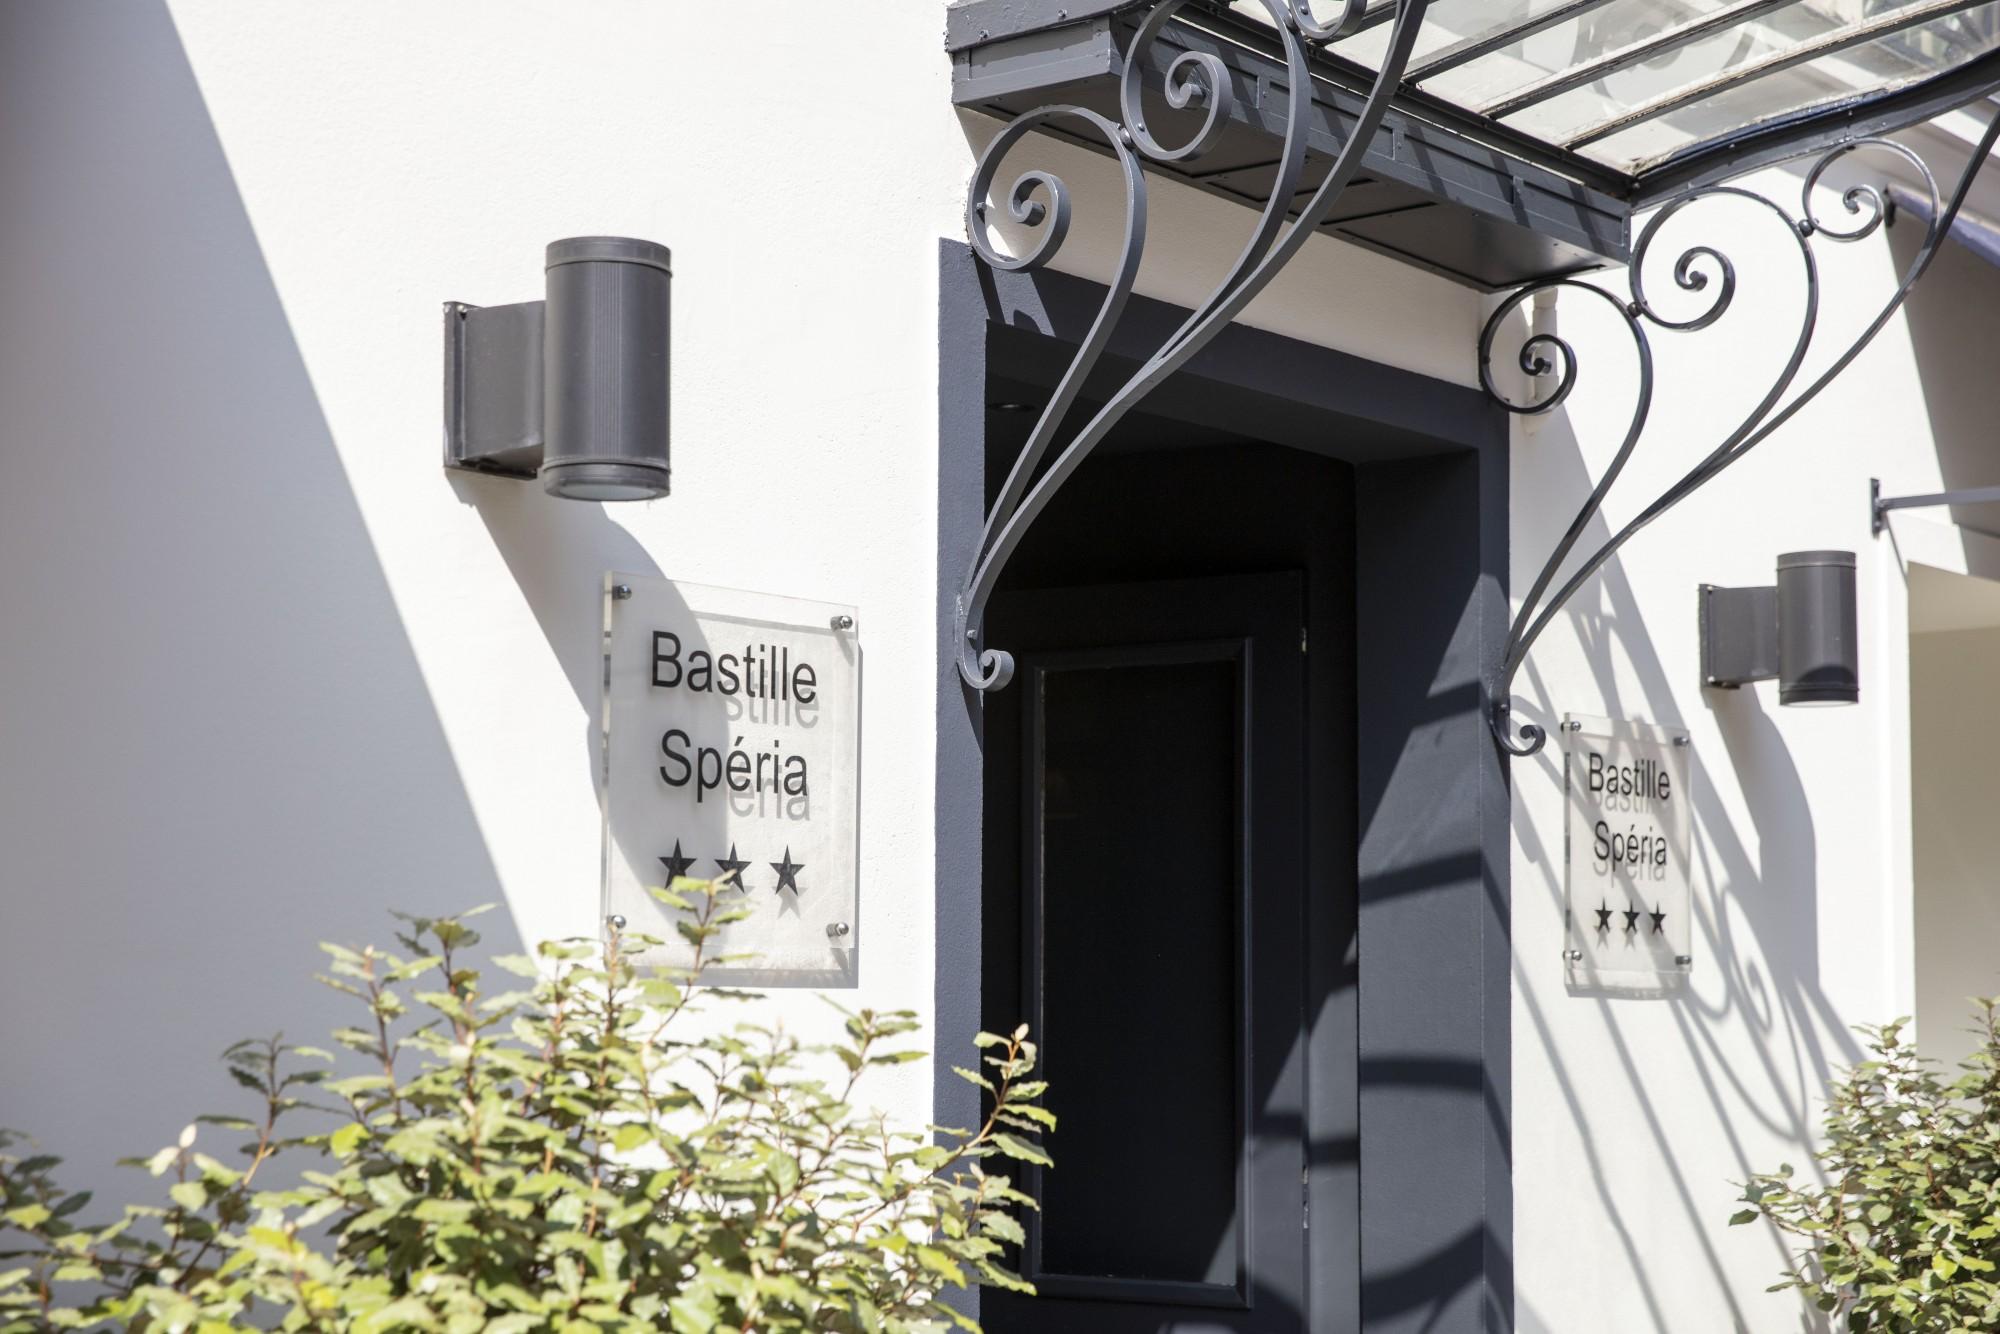 Hotel Bastille Speria   Official website   Hotel Paris Bastille